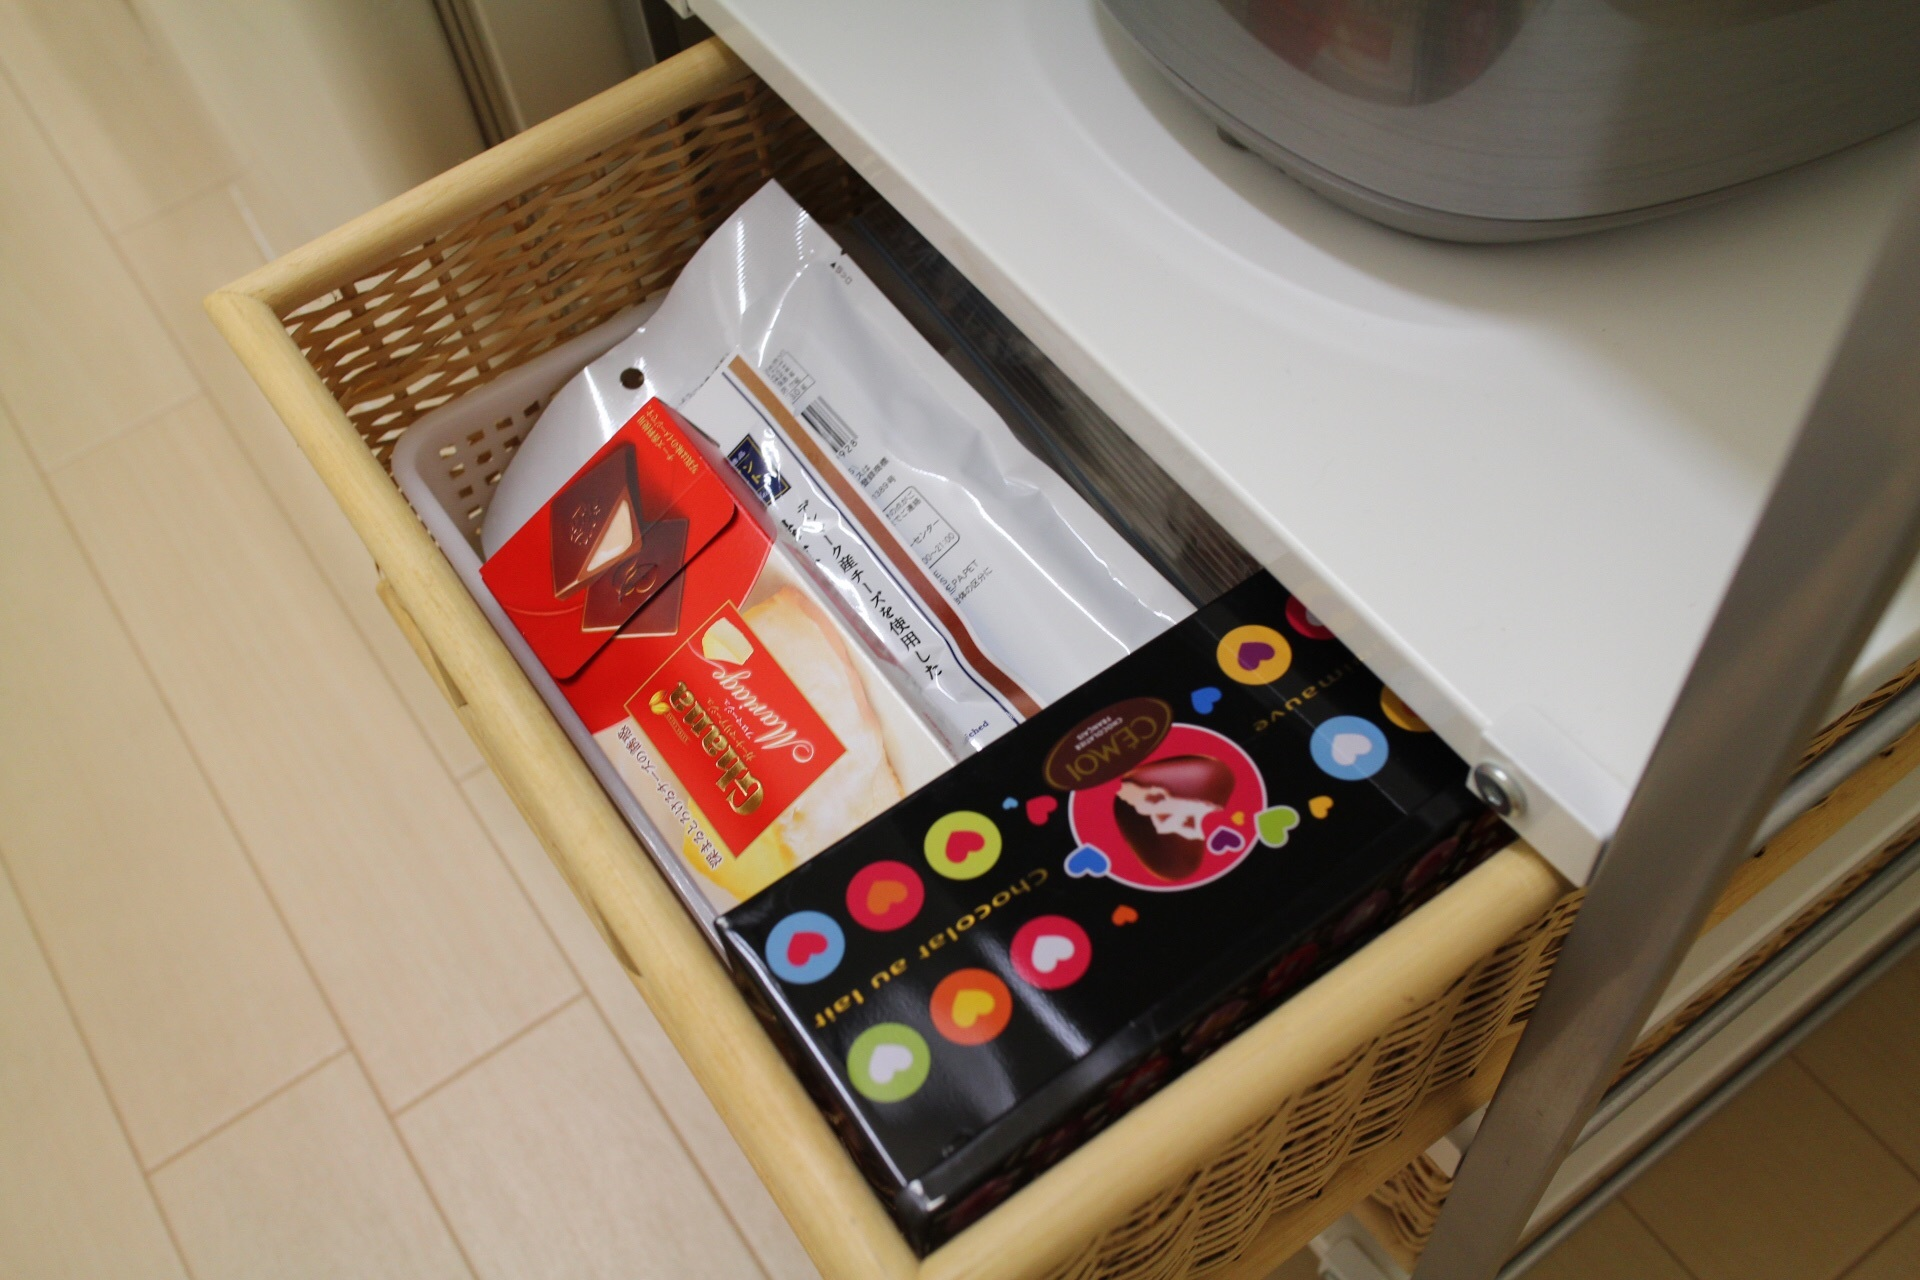 kitchenプチ改造〜after〜(後編)_1_2